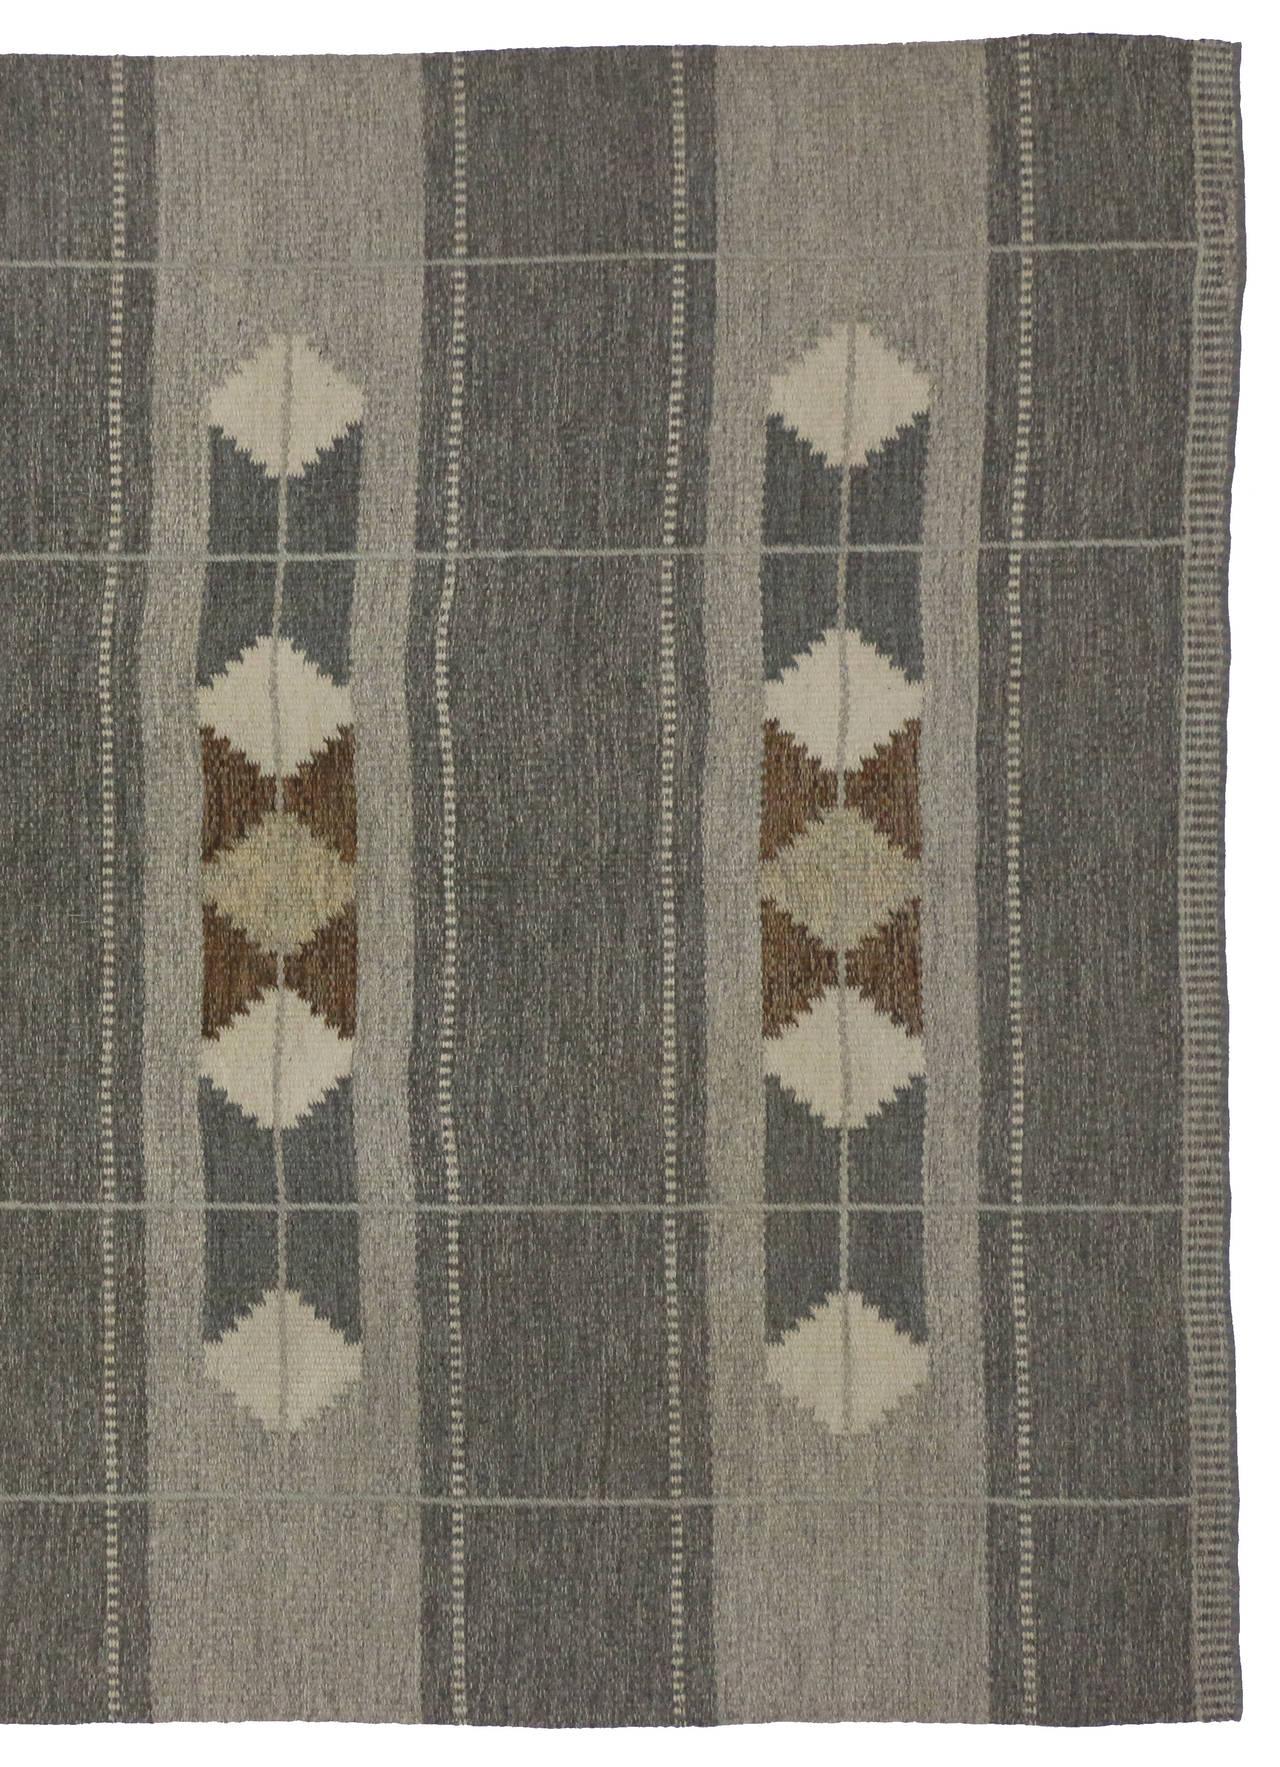 Vintage Swedish Rollakan Gray Kilim Rug with Scandinavian Modern Style For Sale 1